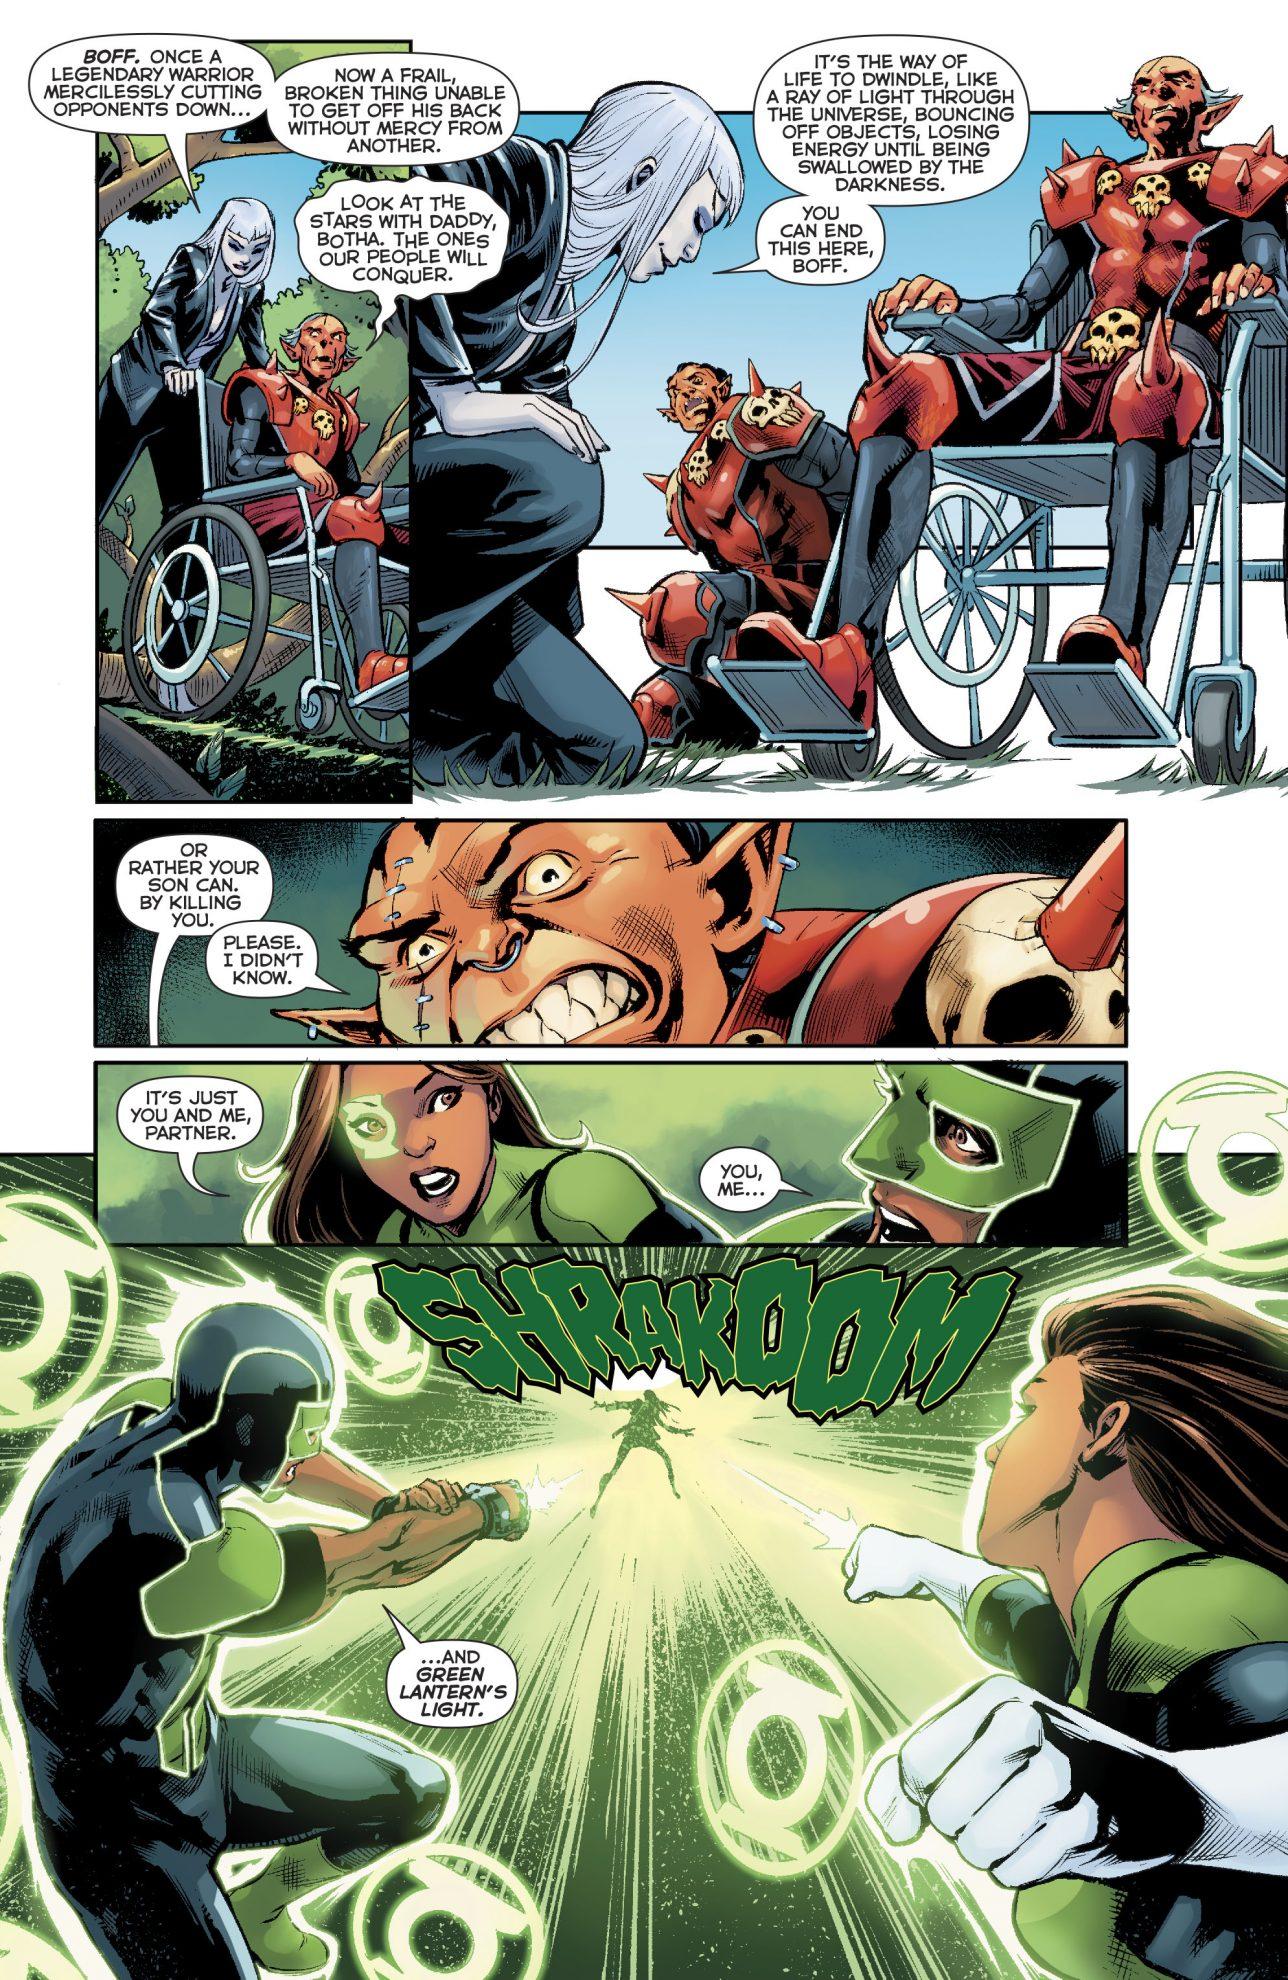 Green Lanterns Simon Baz And Jessica Cruz VS Singularity Jain